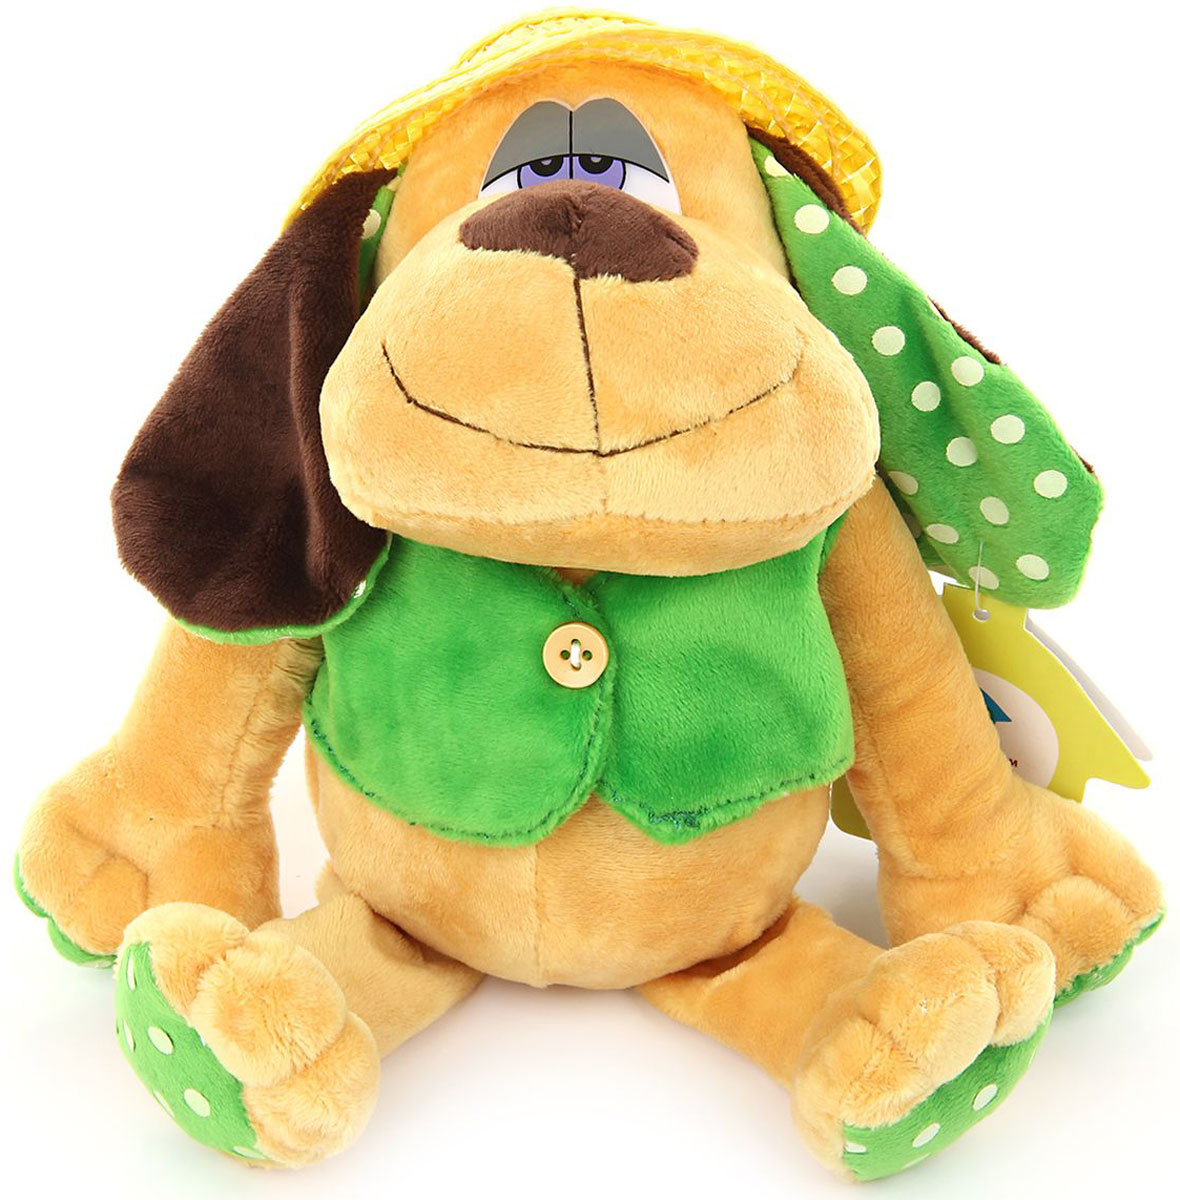 Lapa House Мягкая игрушка Собачка 16 см 54070 радомир мягкая игрушка собака соня 55 см 2008906